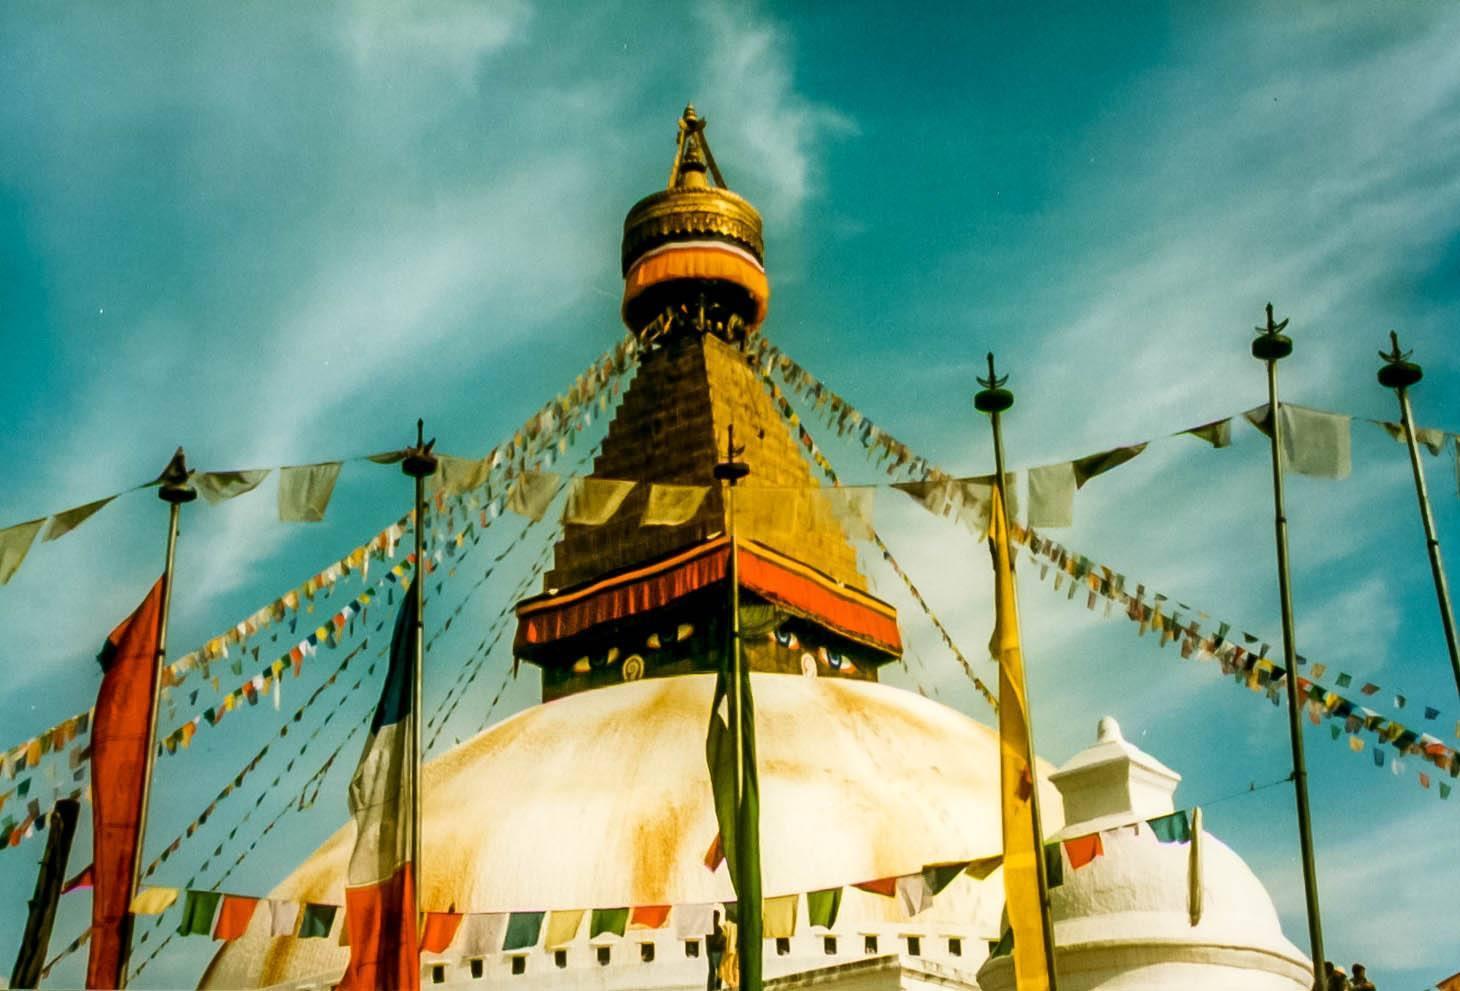 The Boudhanath Stupa in Kathmandu